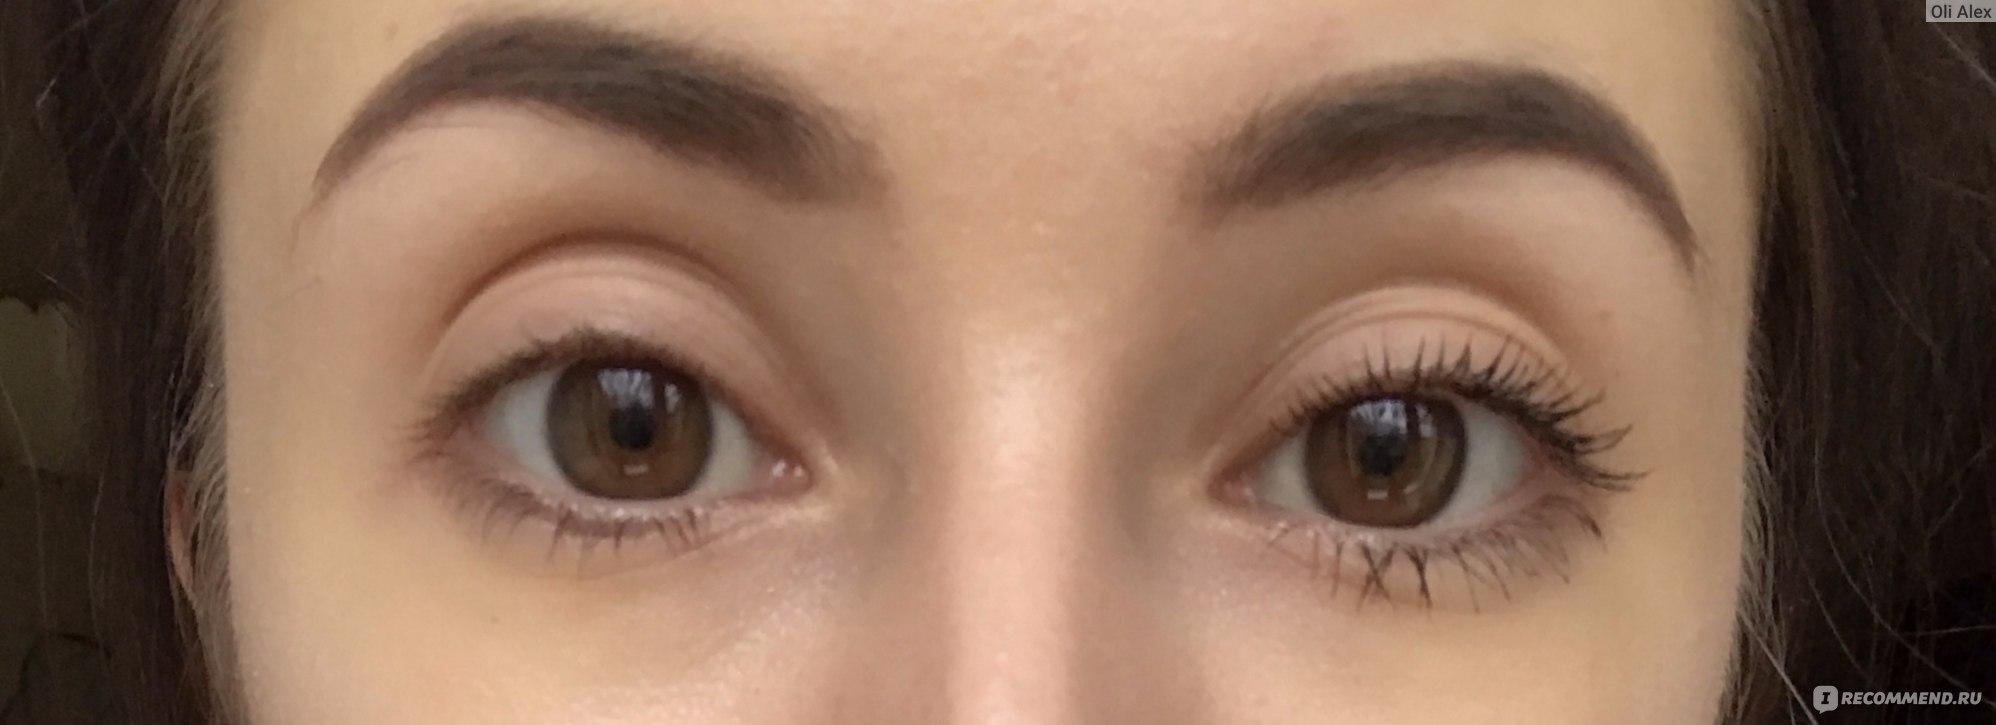 8bb68f59d9f Тушь для ресниц Shiseido Full Lash Multi Dimension Mascara - «Эффект ...